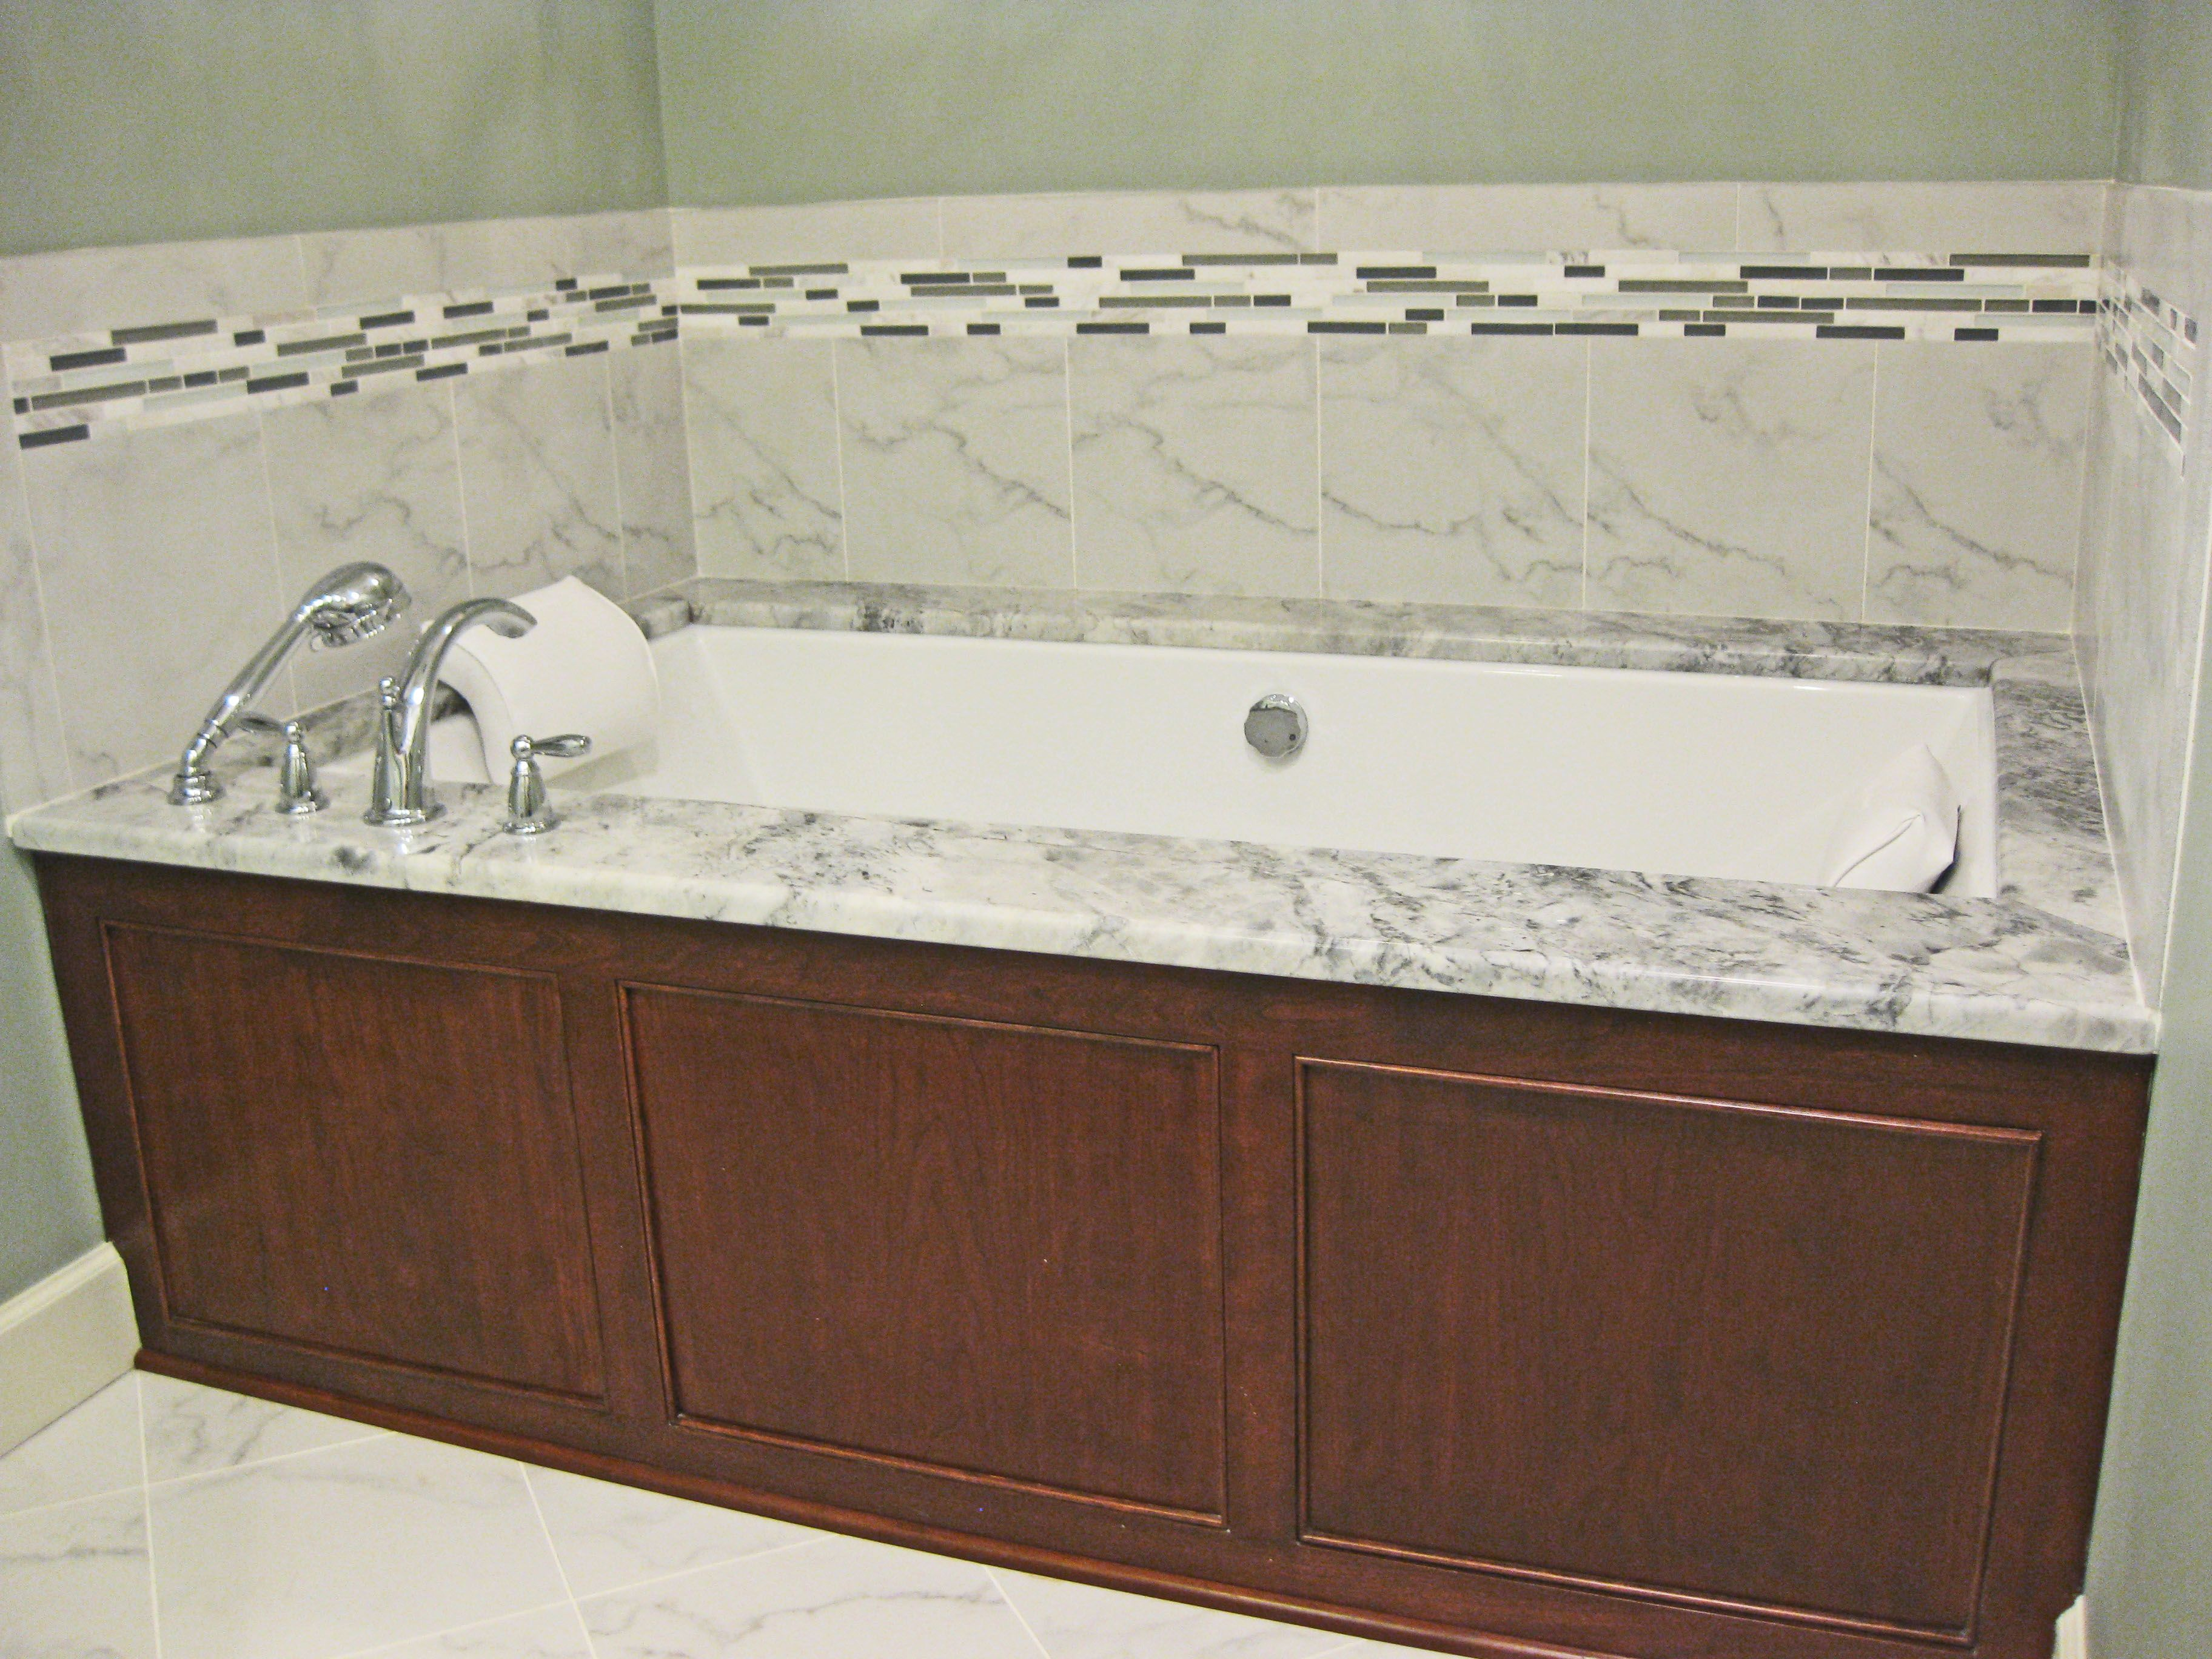 Undermount jacuzzi tub with super white granite surround and white ...